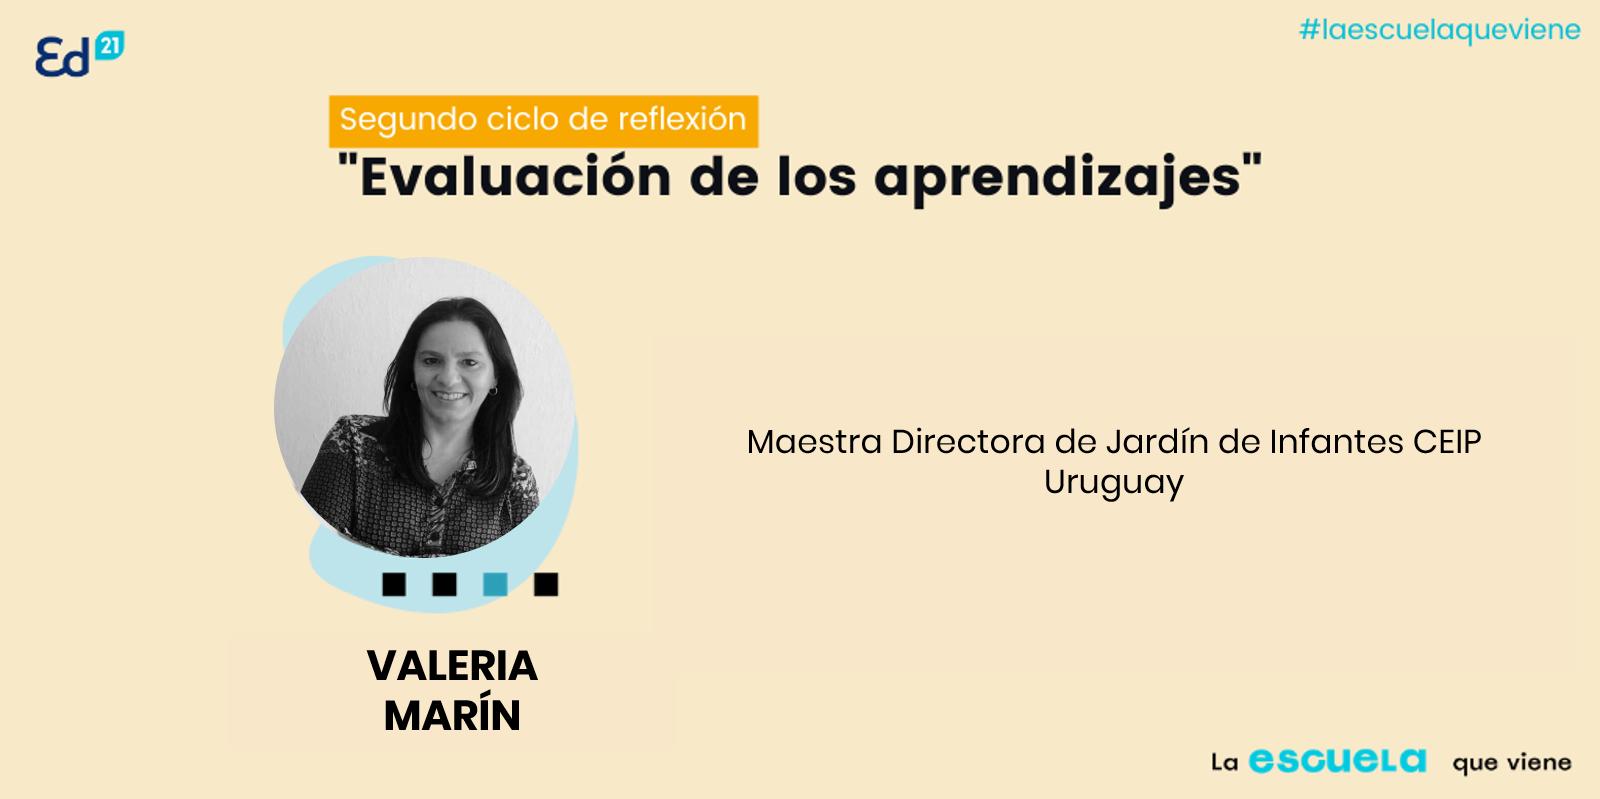 Valeria Marin